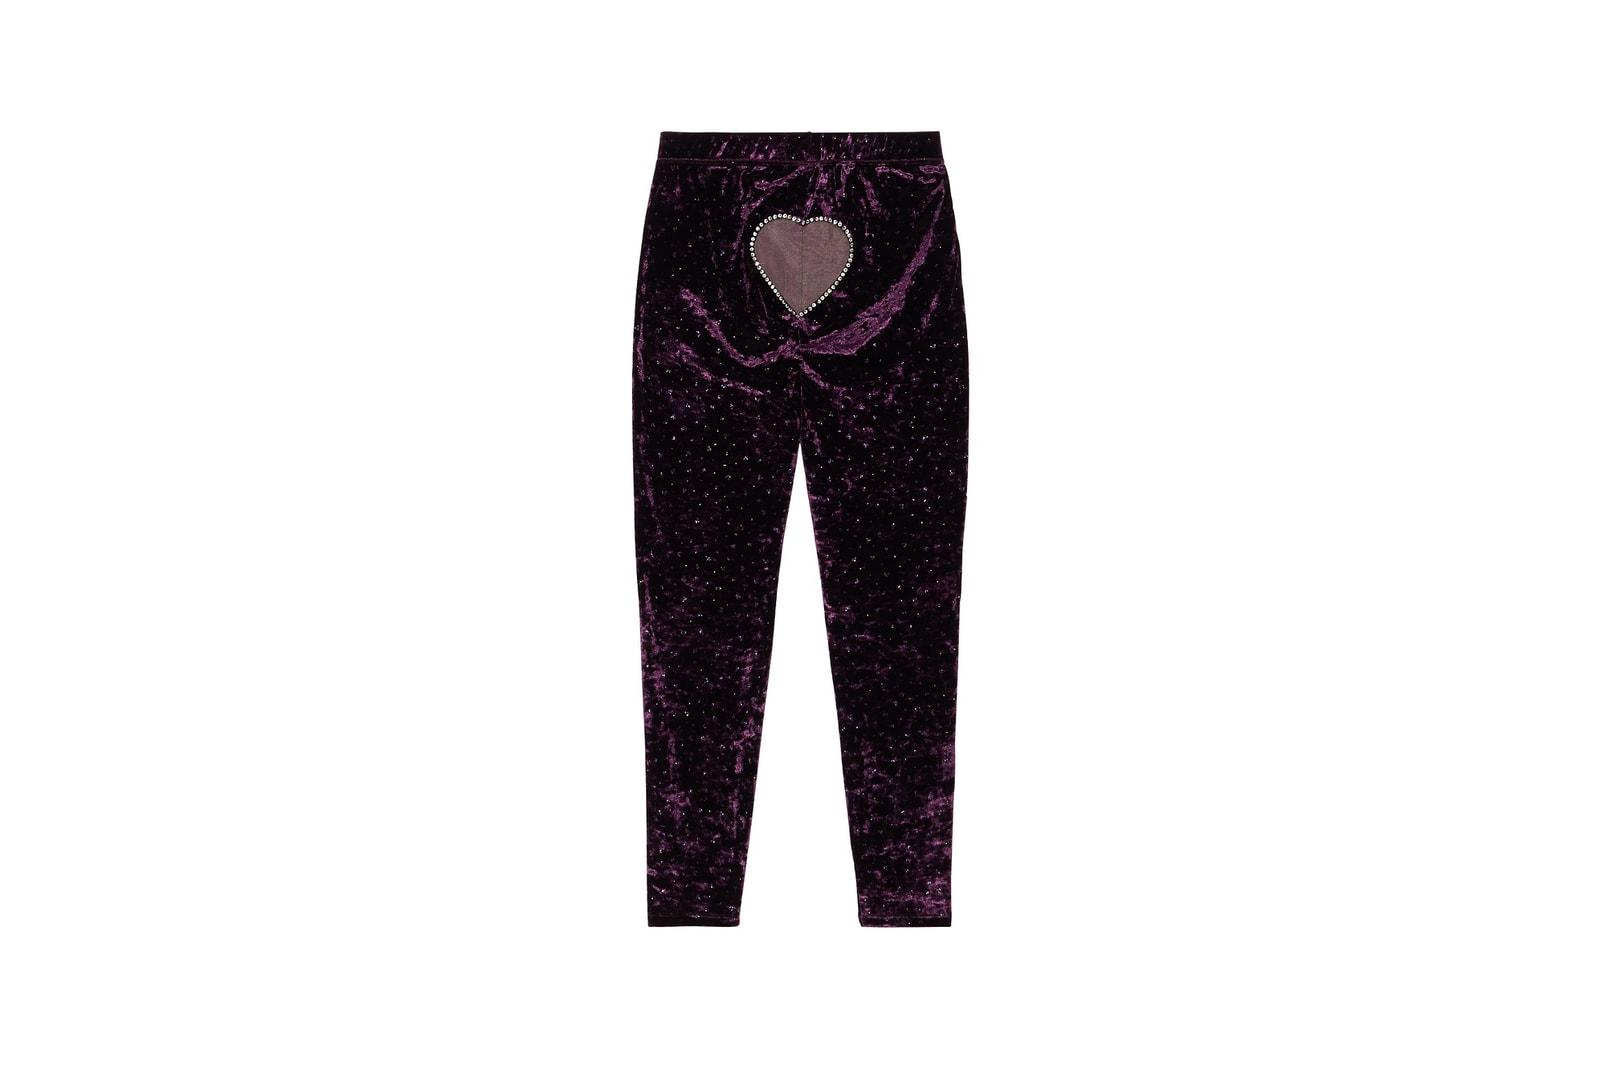 Megan Thee Stallion Rihanna Savage X Fenty Holiday Collection Campaign Lingerie Bra Underwear